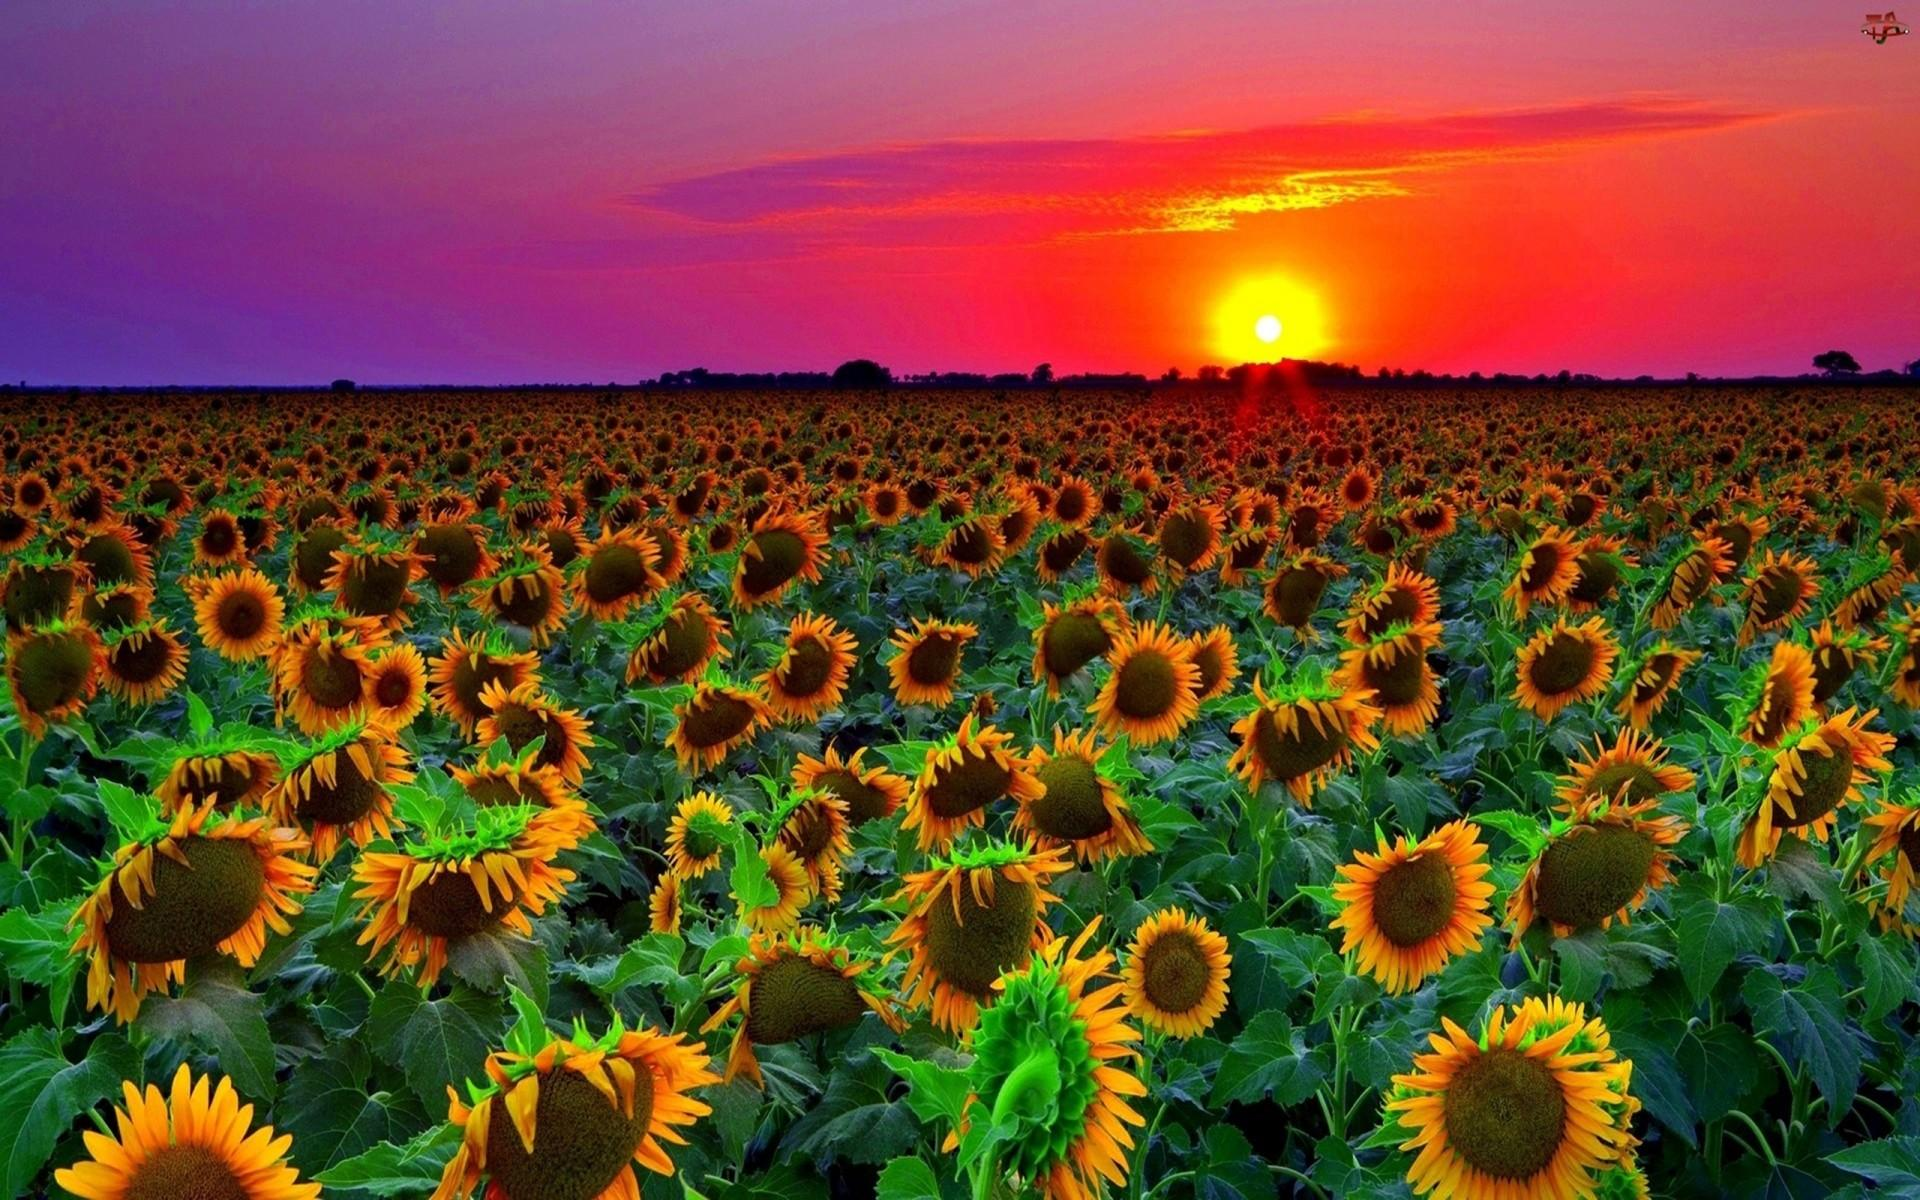 Sunflower Sunset Laptop Wallpapers Top Free Sunflower Sunset Laptop Backgrounds Wallpaperaccess